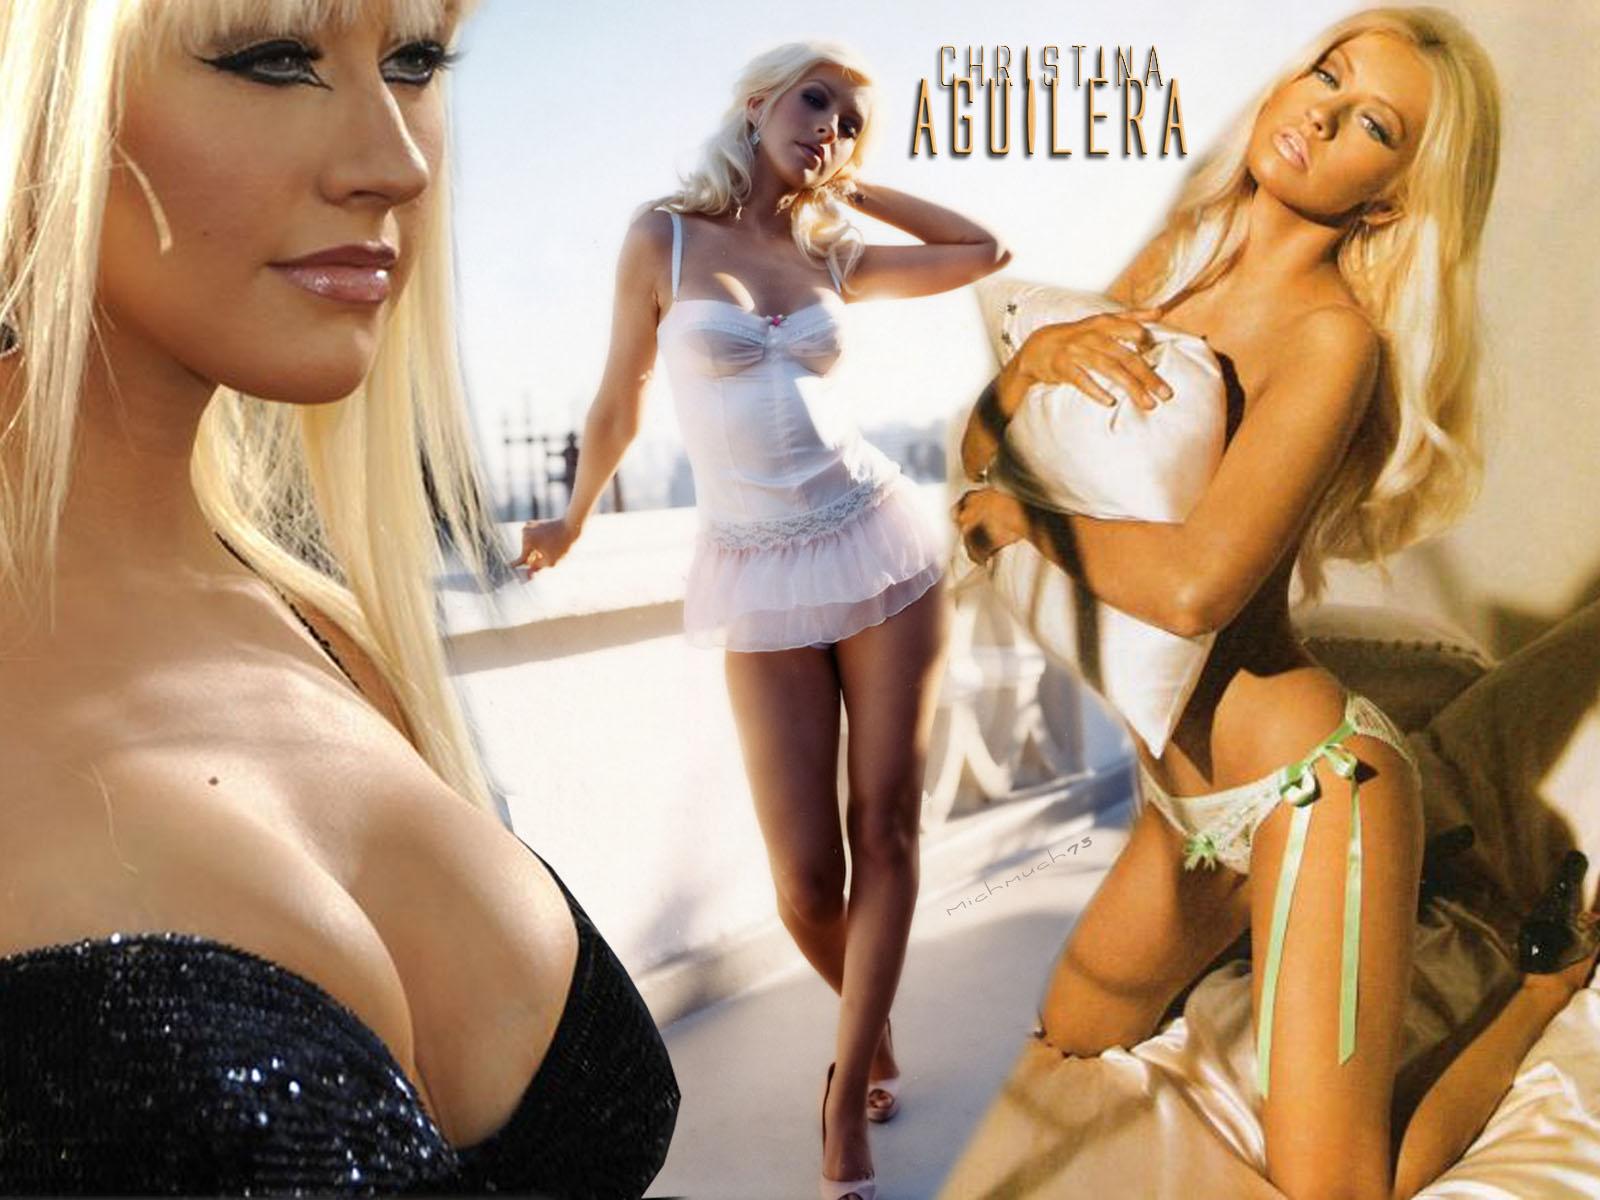 http://1.bp.blogspot.com/-m5r01A62qGE/UEUdEpmZmlI/AAAAAAAAEmw/wkG577Pspjs/s1600/christina_aguilera_220.jpg